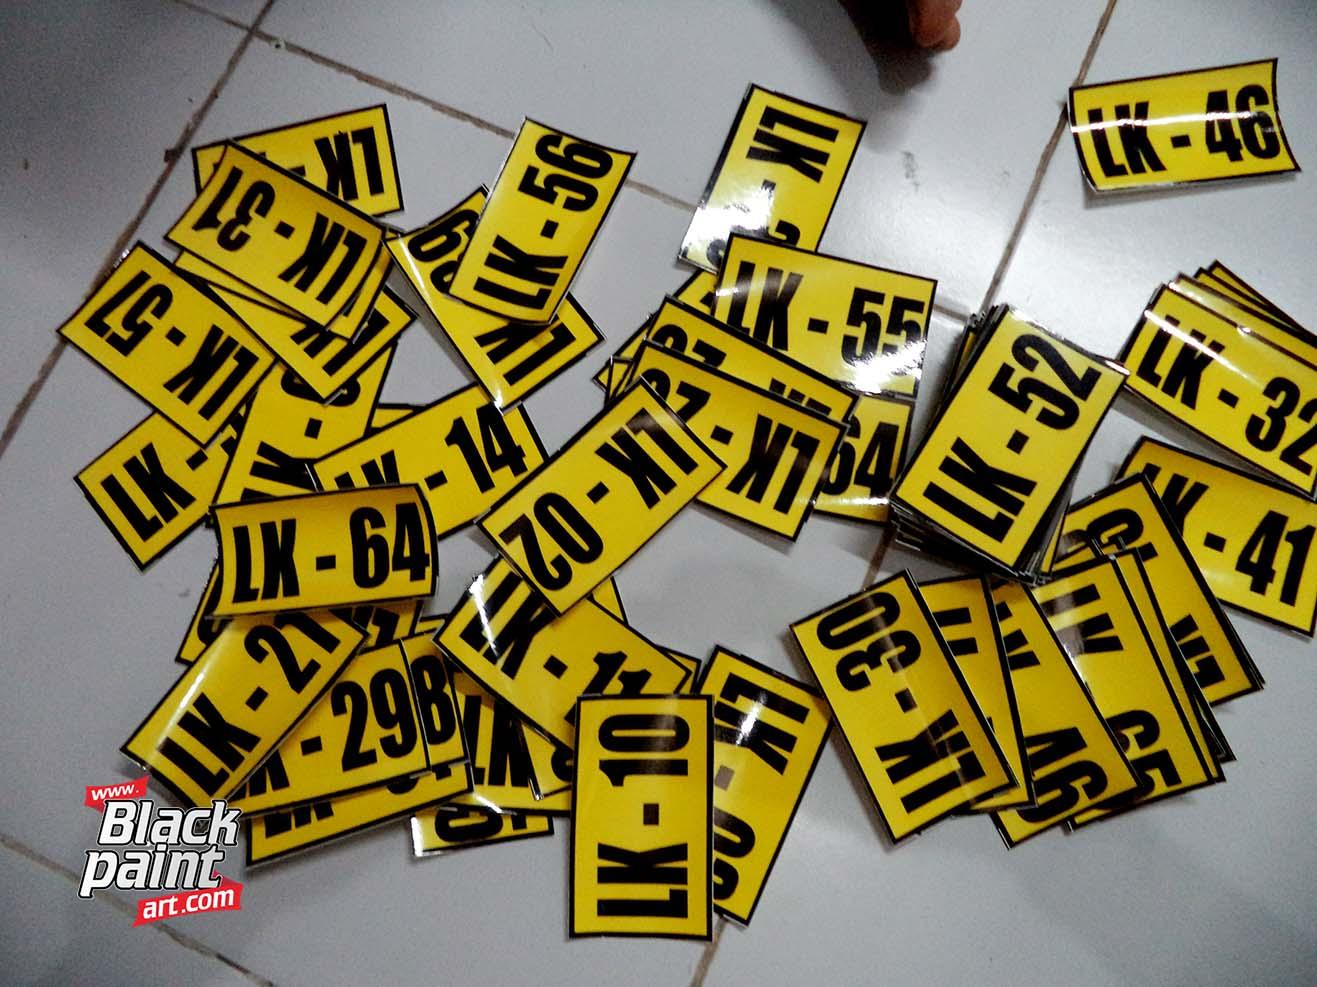 150 stiker pekanbaru.jpg